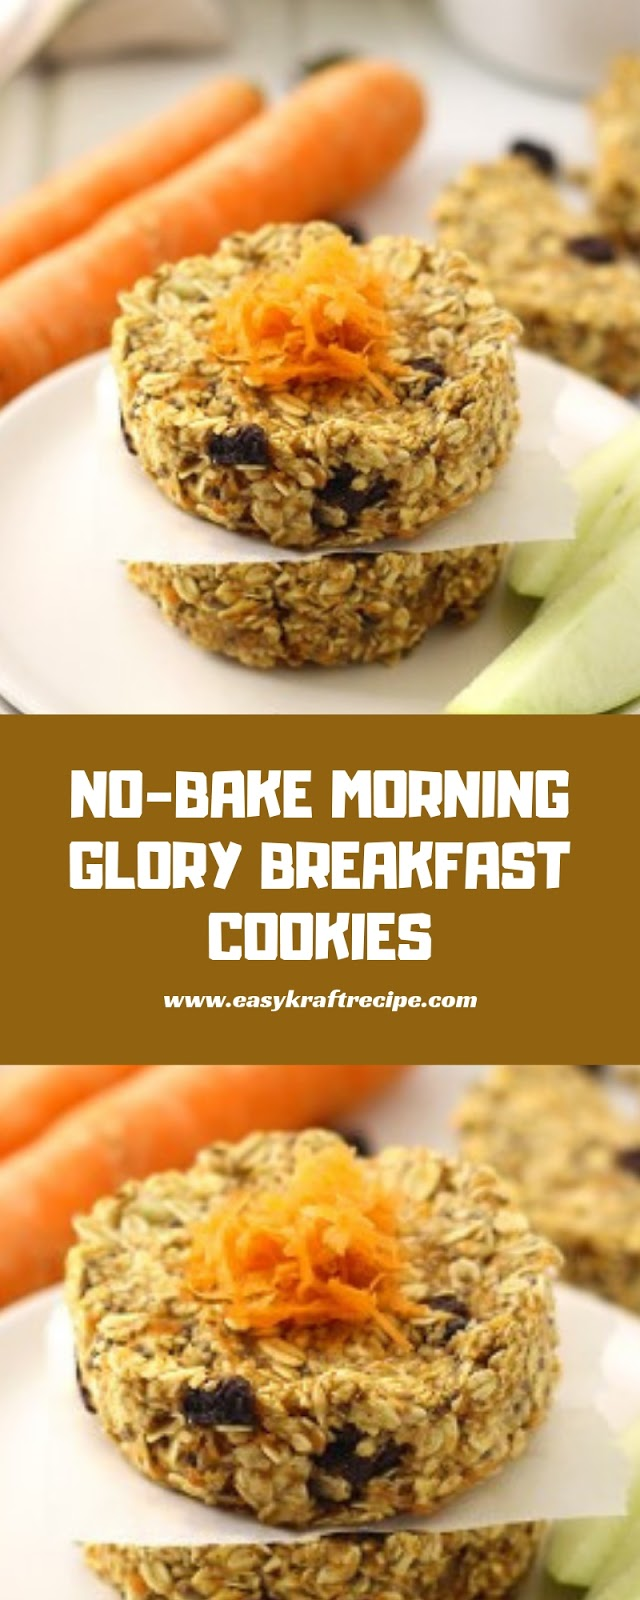 NO BAKE MORNING GLORY BREAKFAST COOKIES